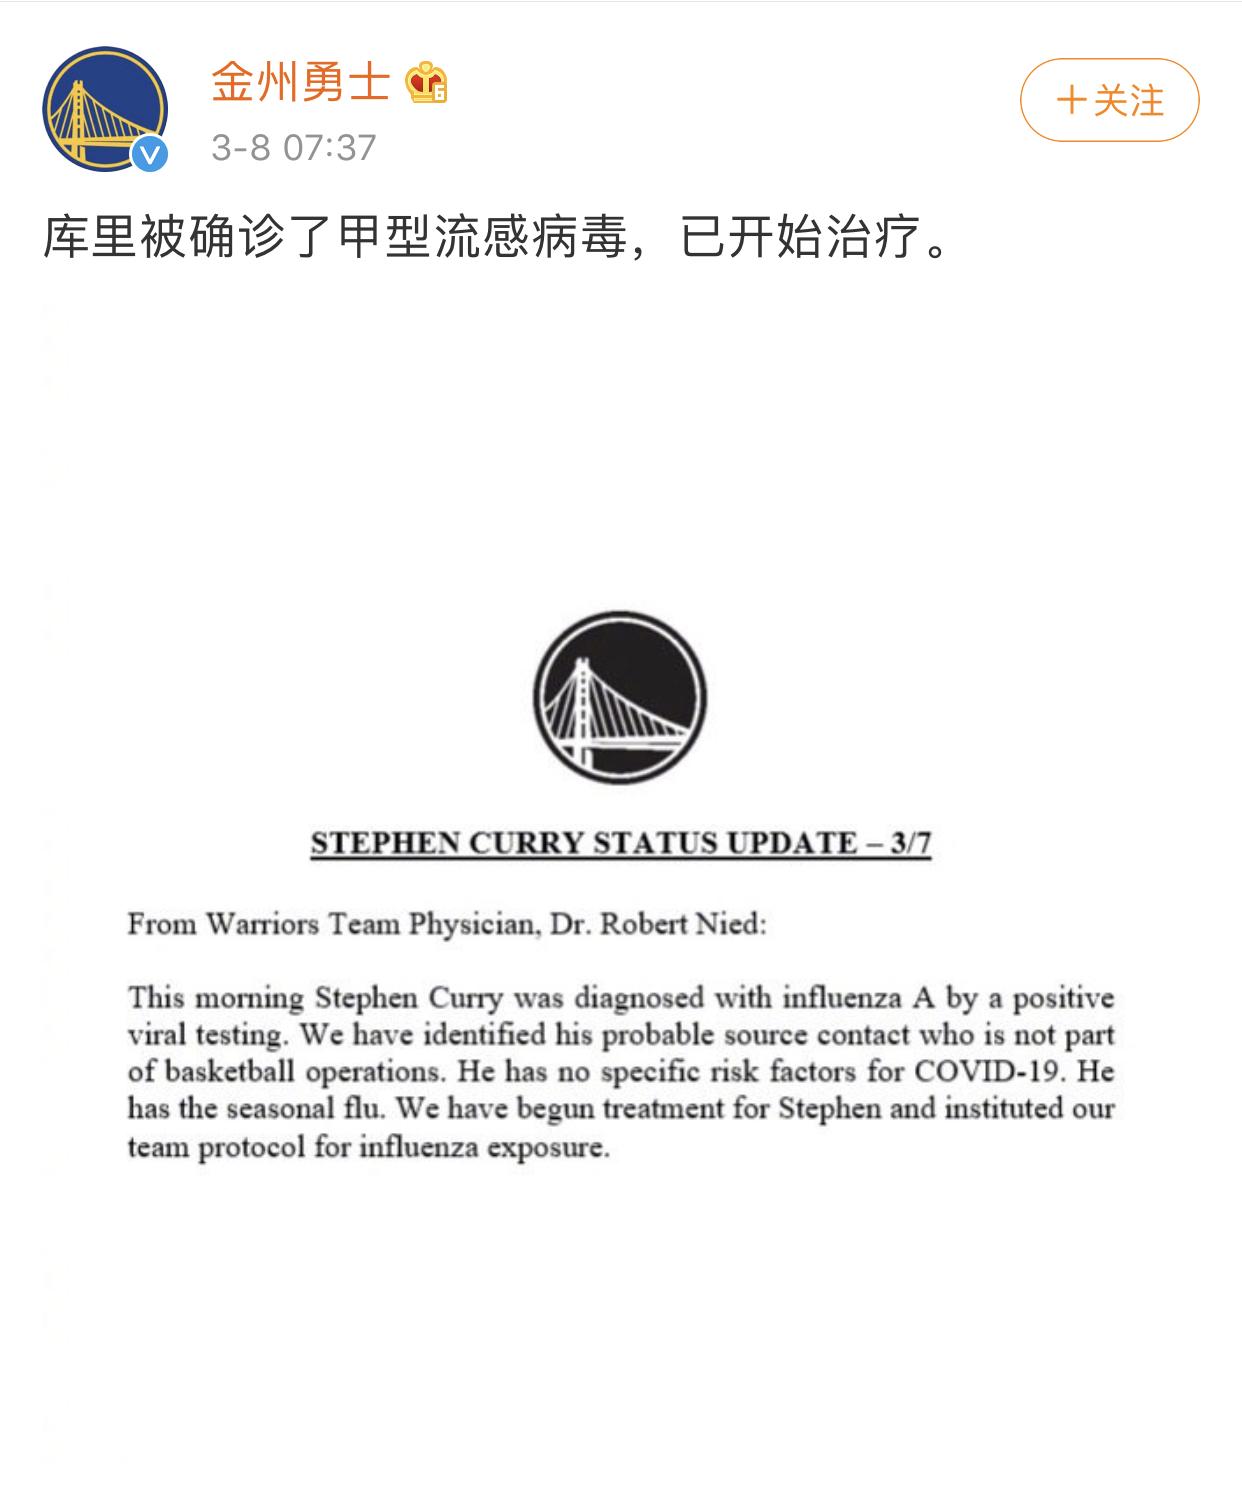 NBA球星库里确诊感染甲型流感病毒,已开始接受治疗